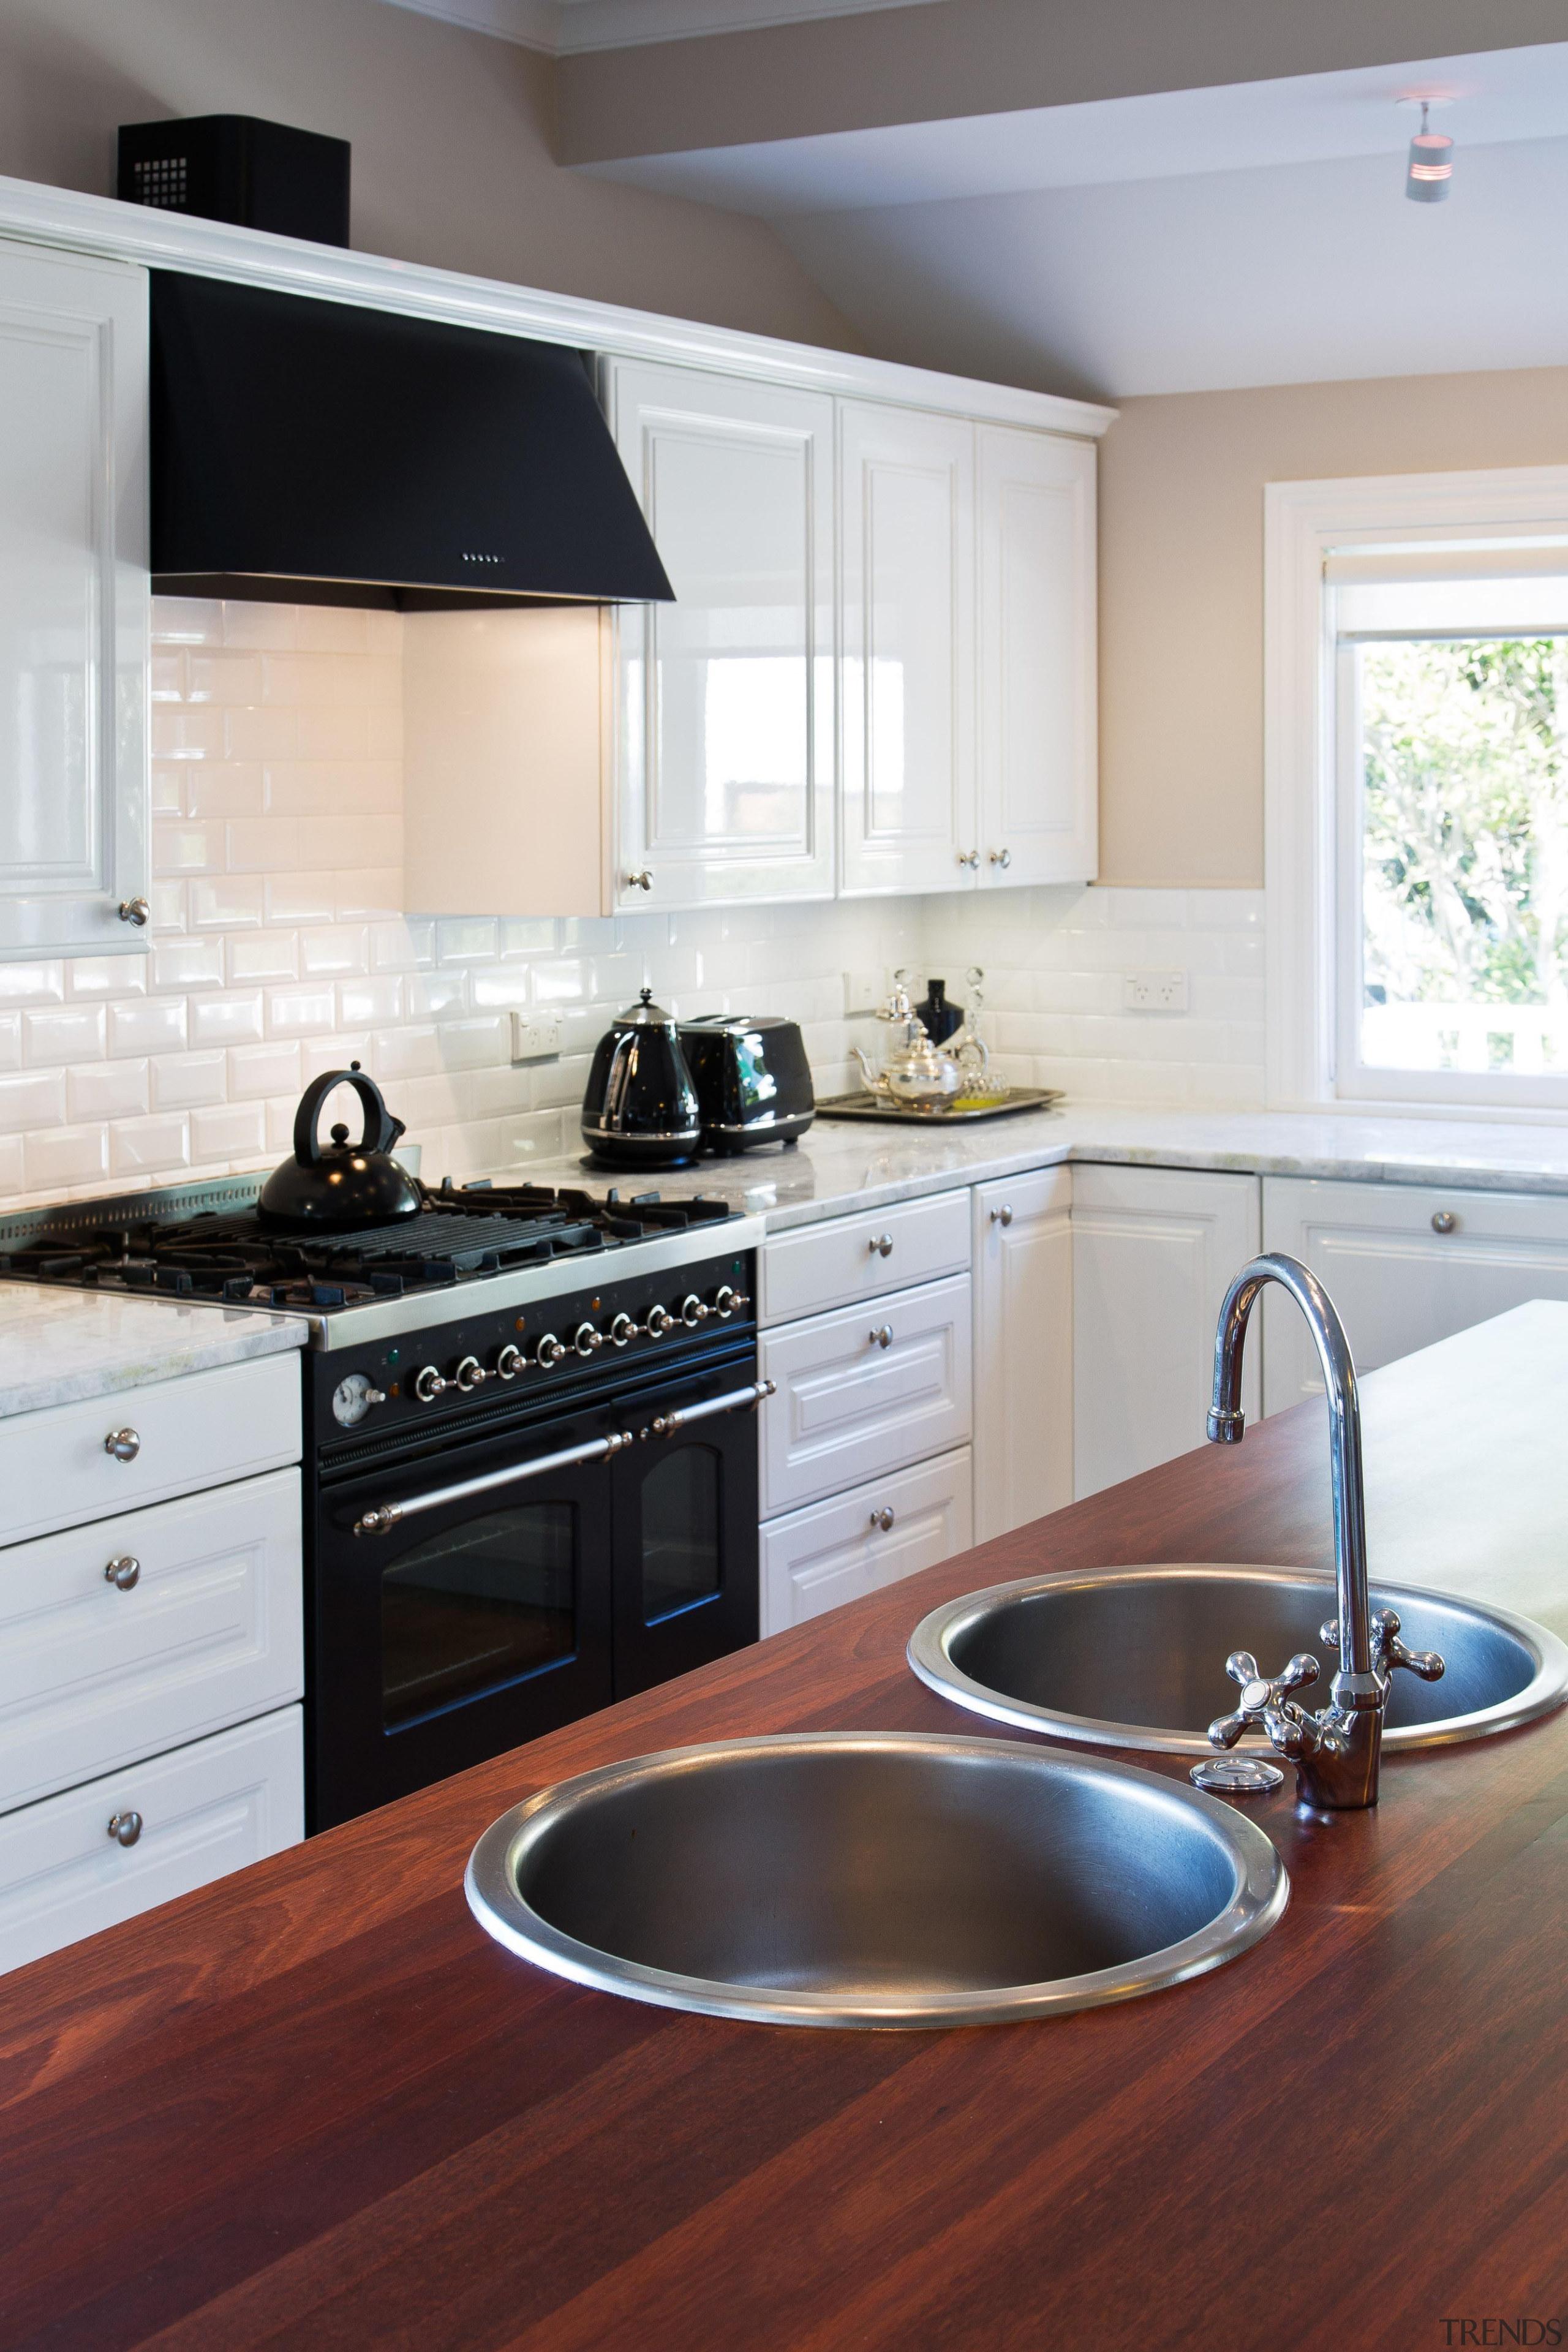 burnham7.jpg - burnham7.jpg - cabinetry | countertop | cabinetry, countertop, cuisine classique, floor, flooring, hardwood, home, interior design, kitchen, room, wood flooring, white, gray